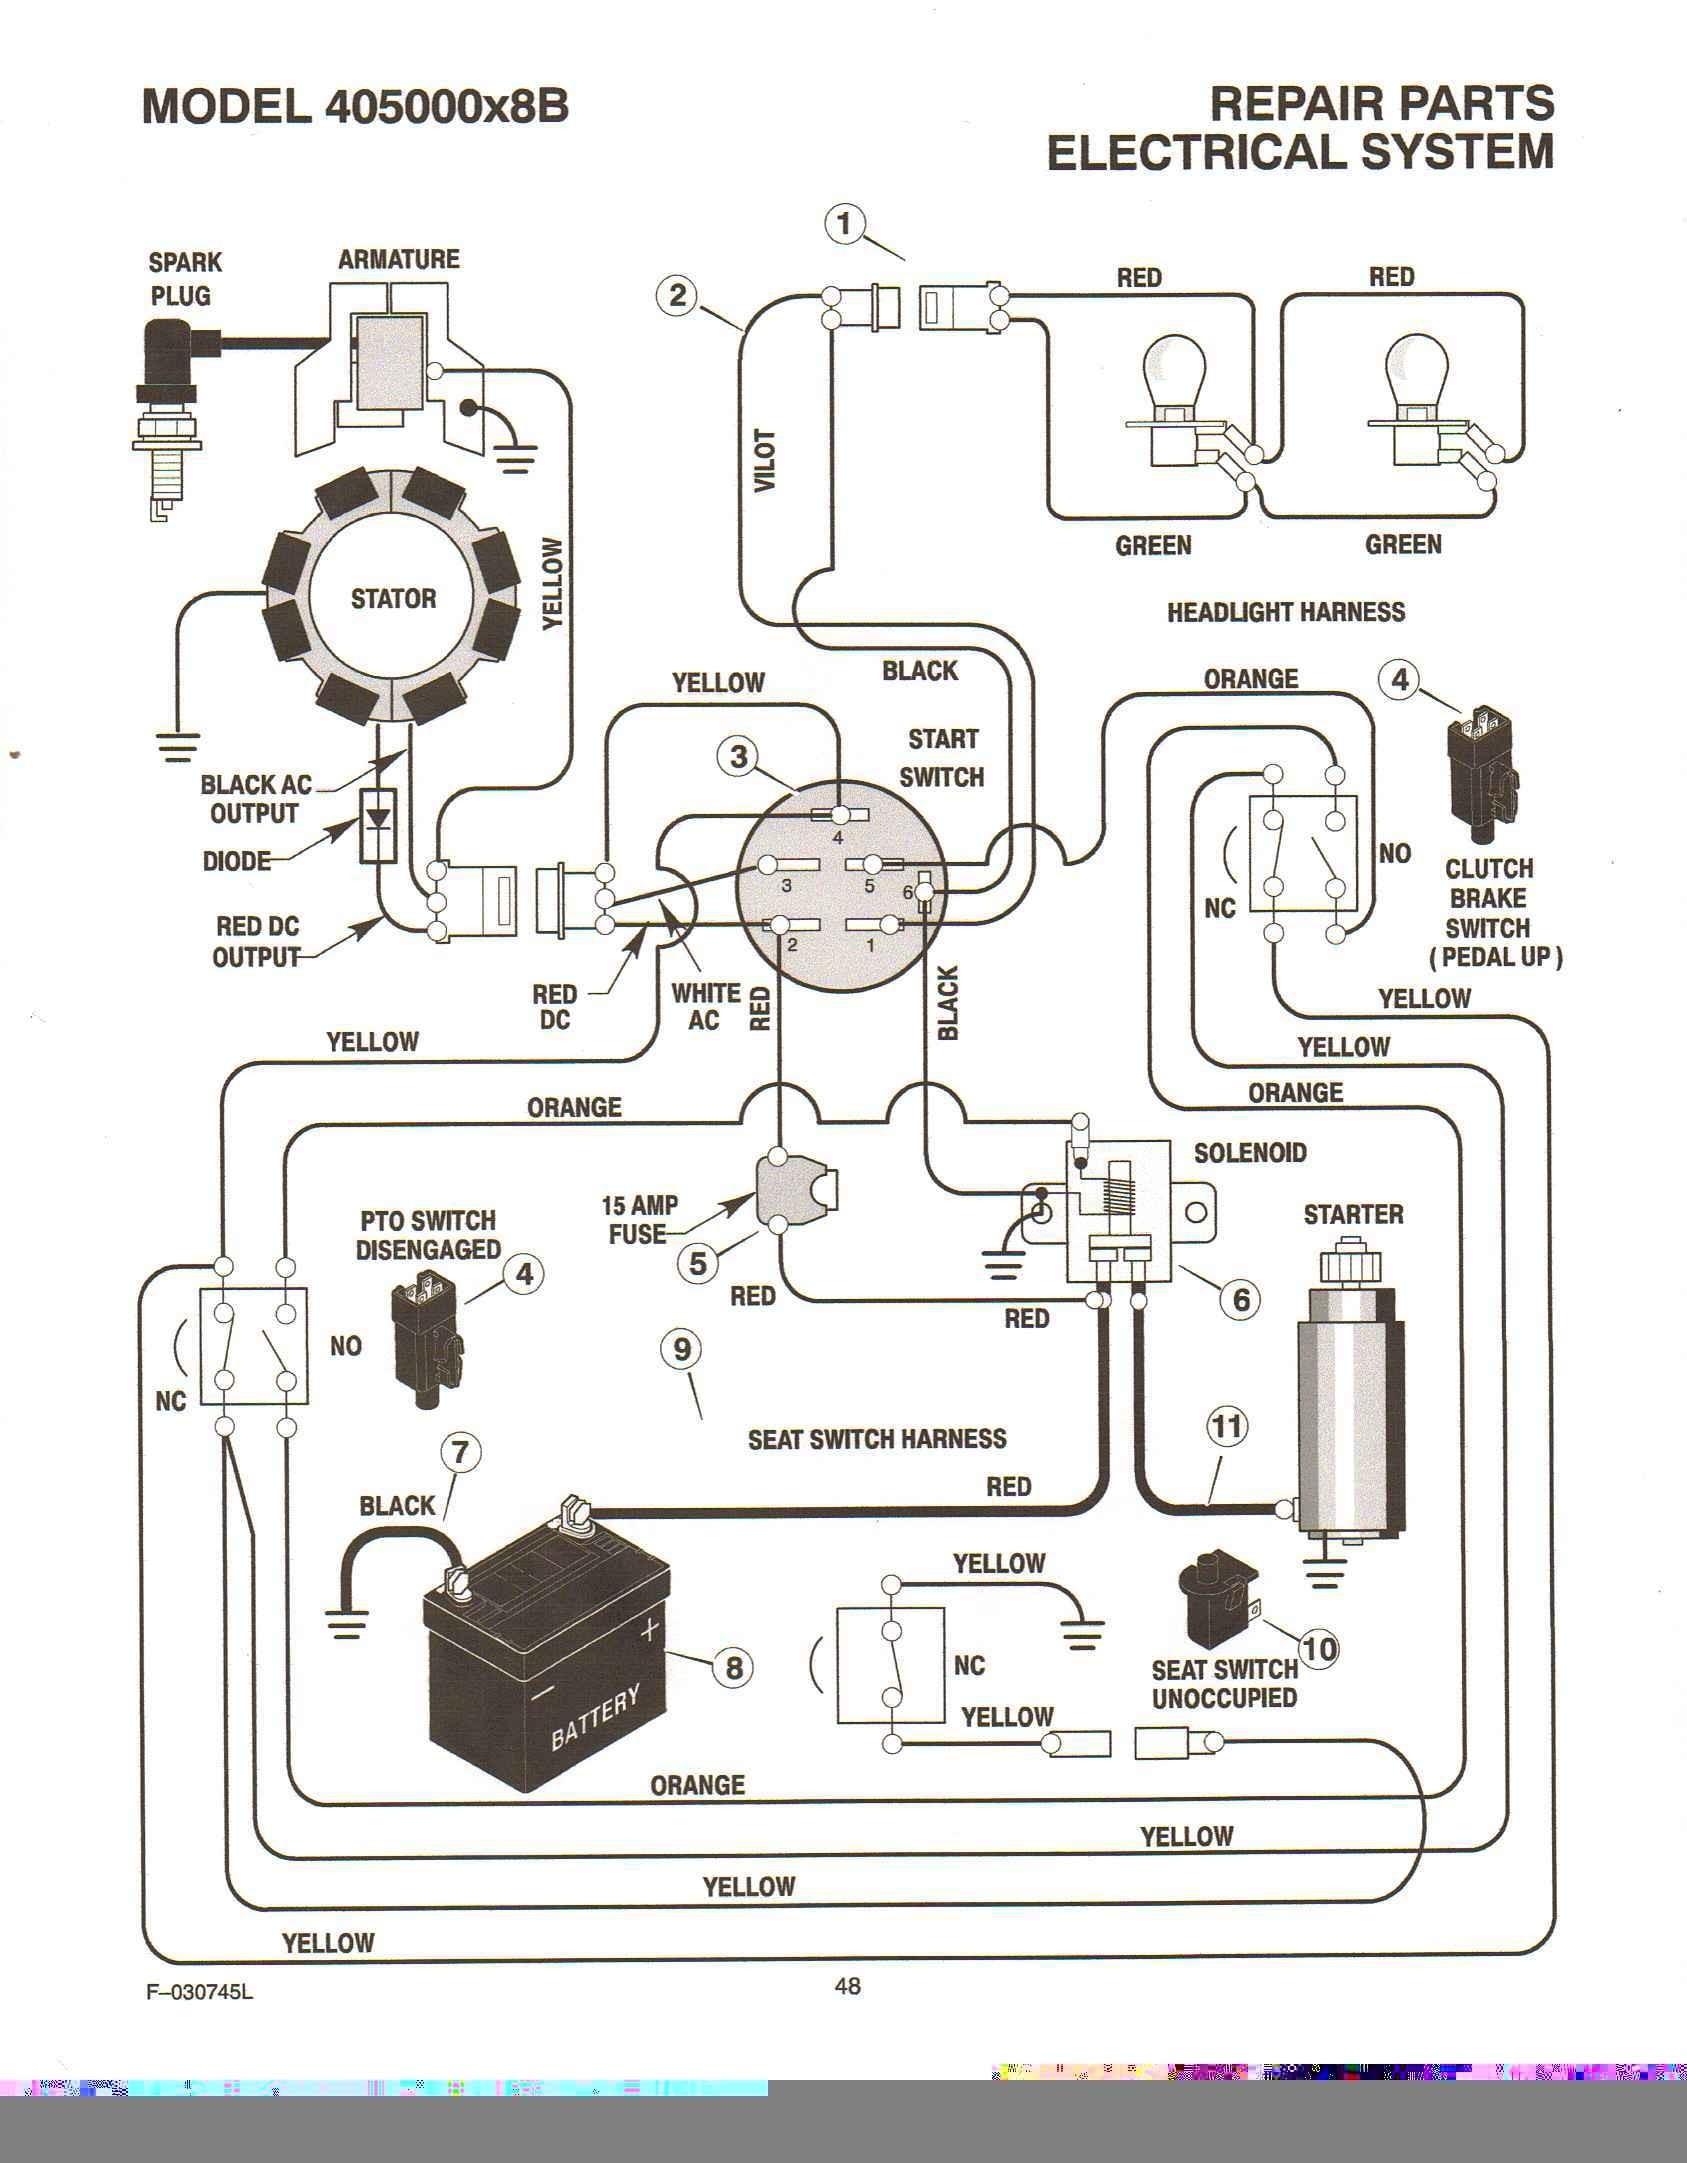 1993 dodge dynasty wiring diagram 2003 dodge wiring